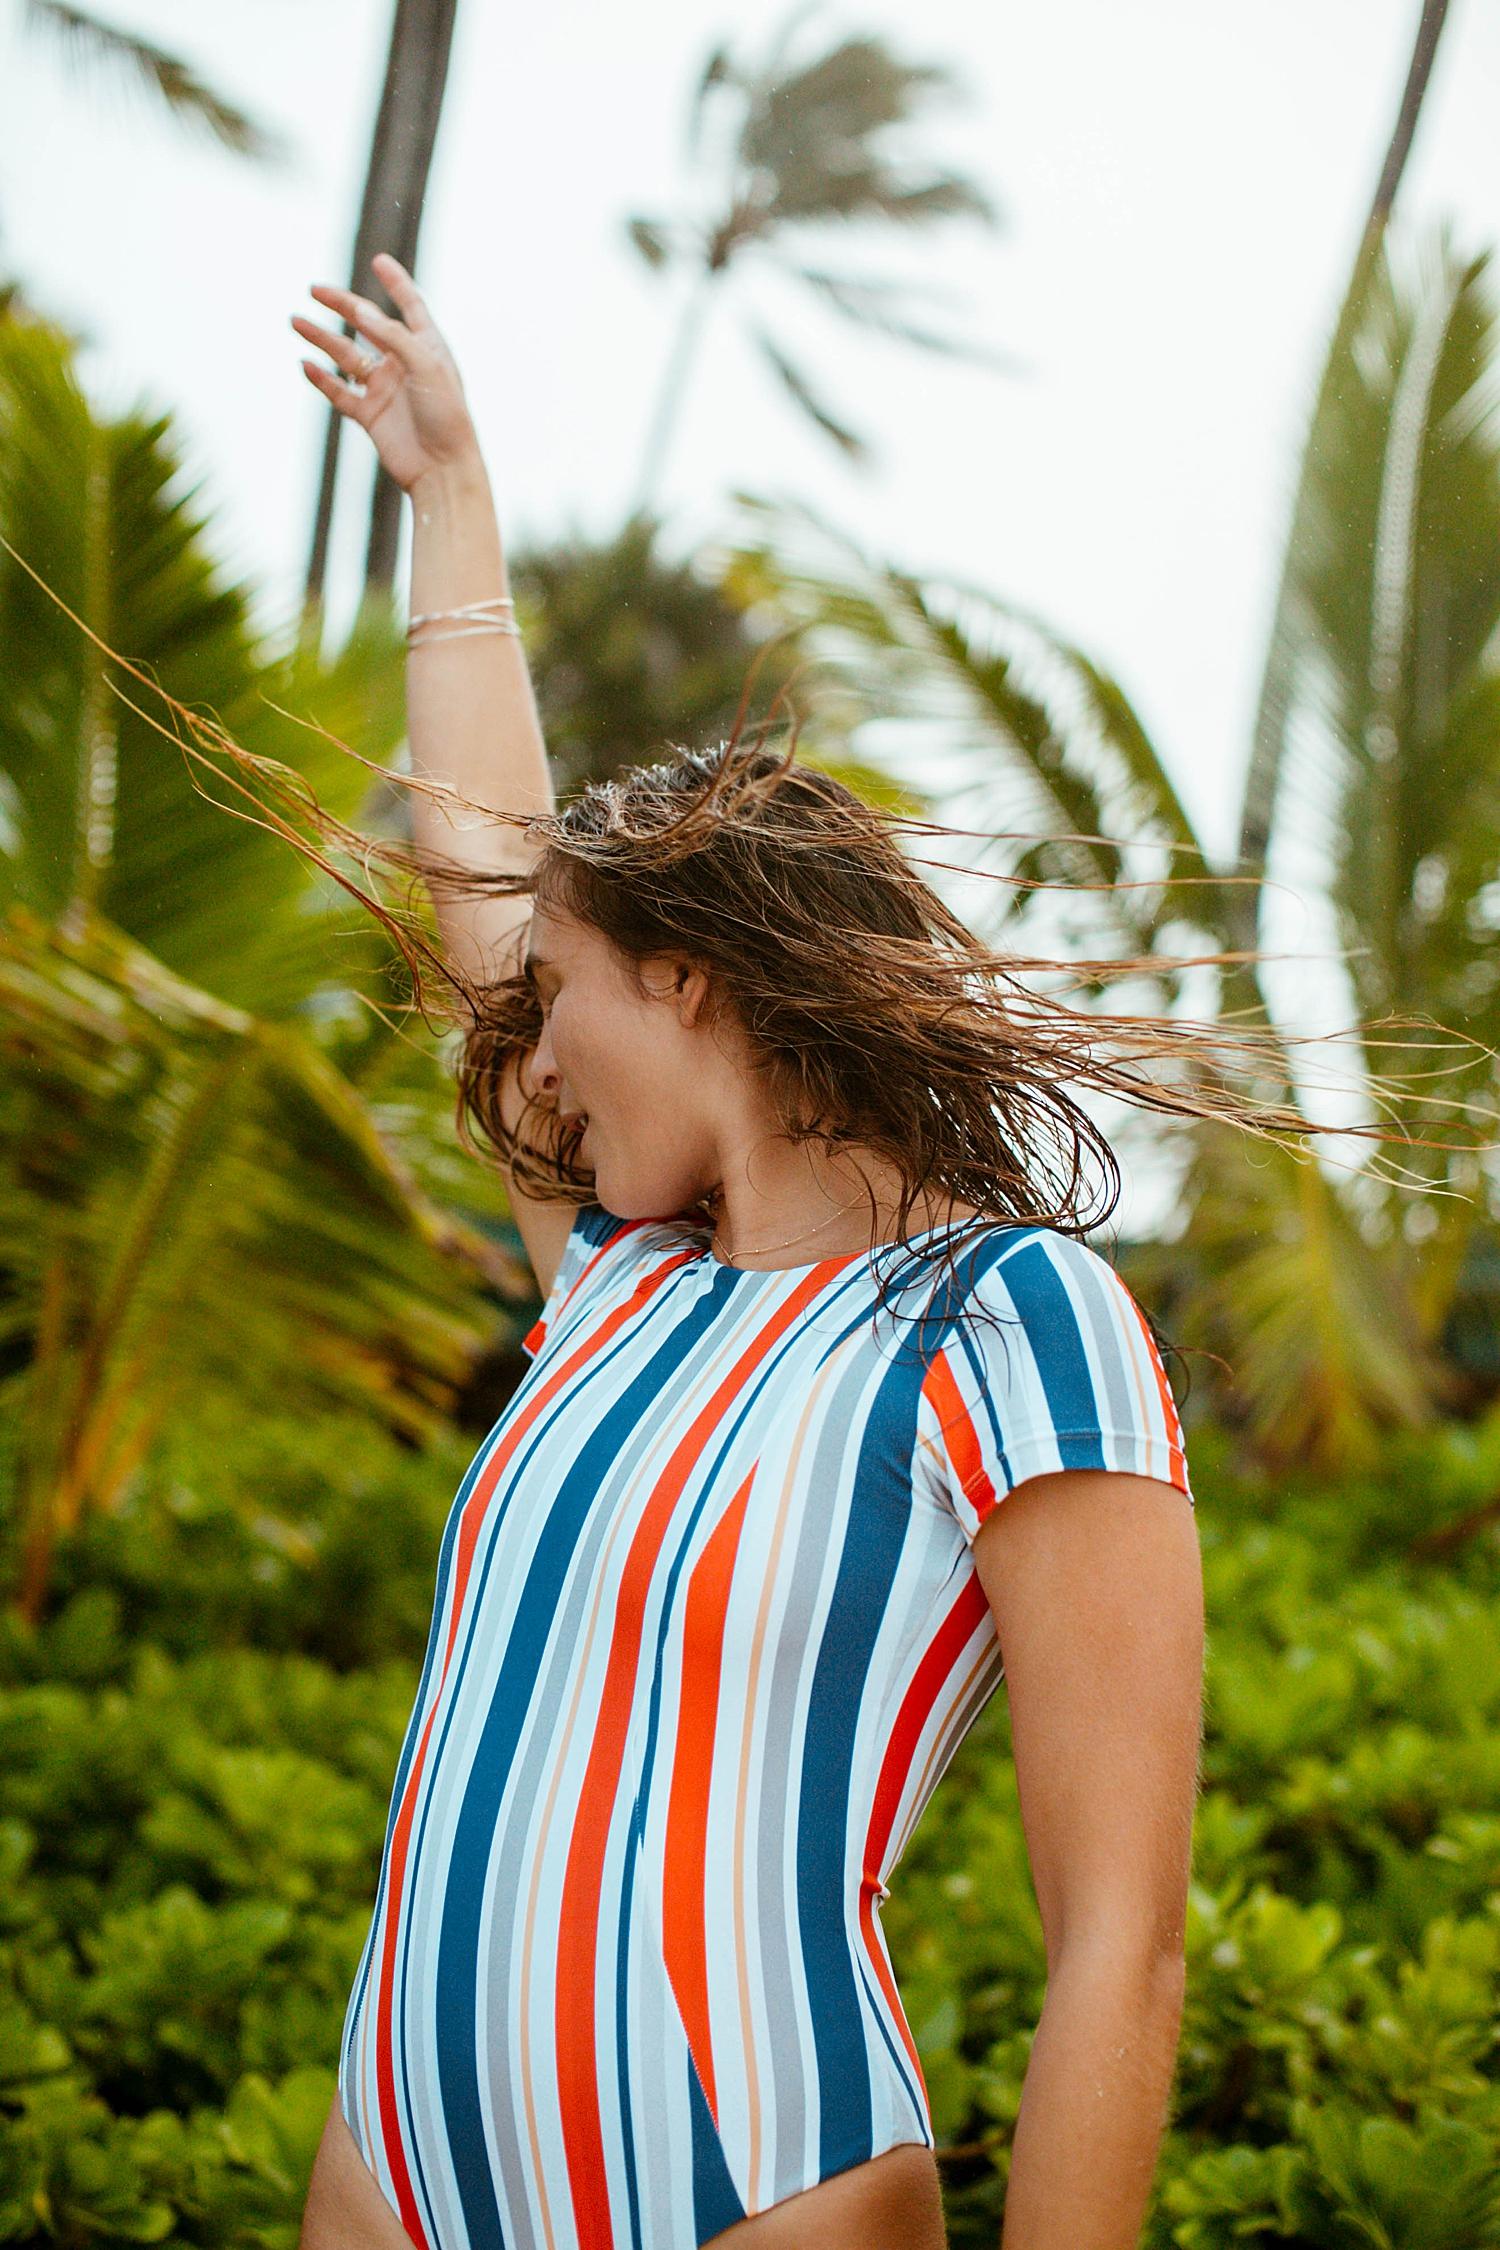 Travel & Lifestyle Fashion Photography with Benoa Swim, Cami and Jax, Bailey Nagy and Kiana Fores by Kelee Bovelle on North Shore Oahu Hawaii_0011.jpg